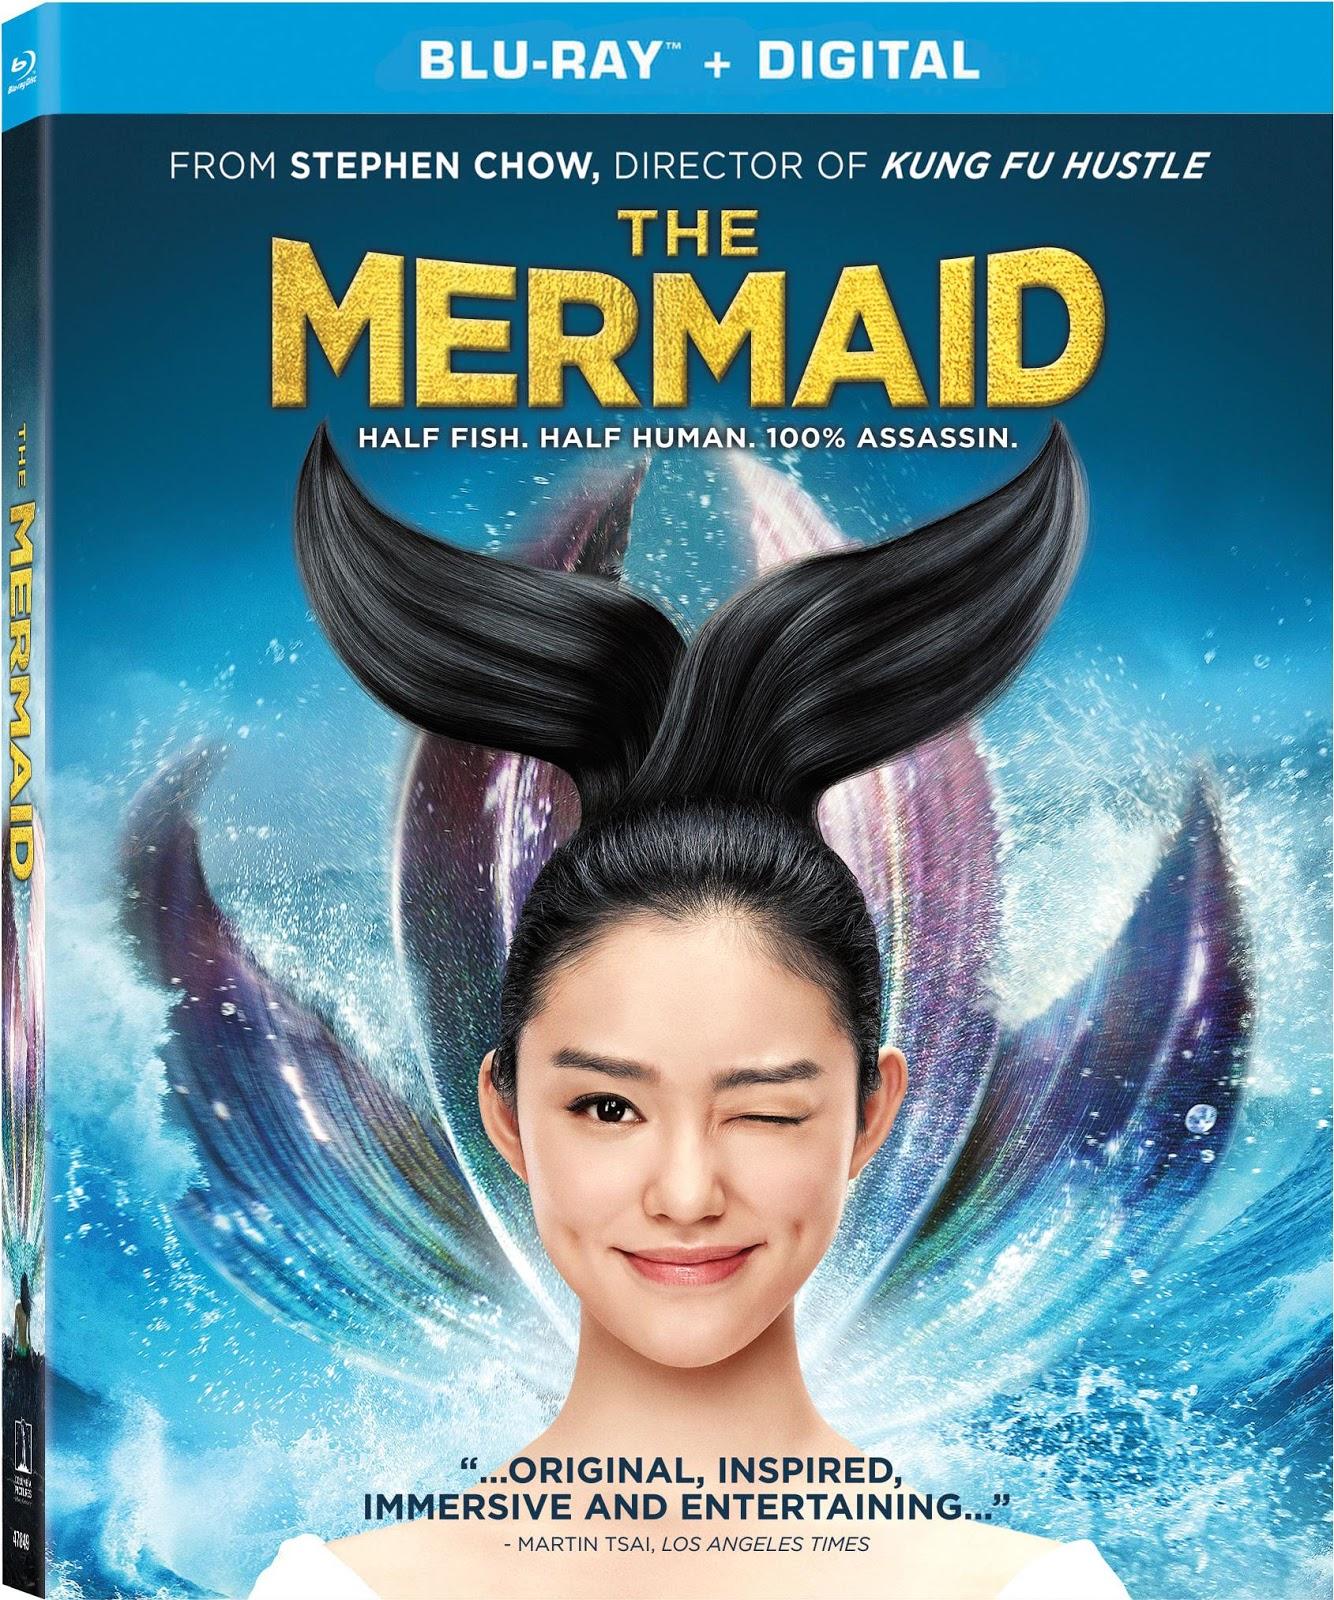 the mermaid hindi dubbed hollywood full movie 2017 || latest